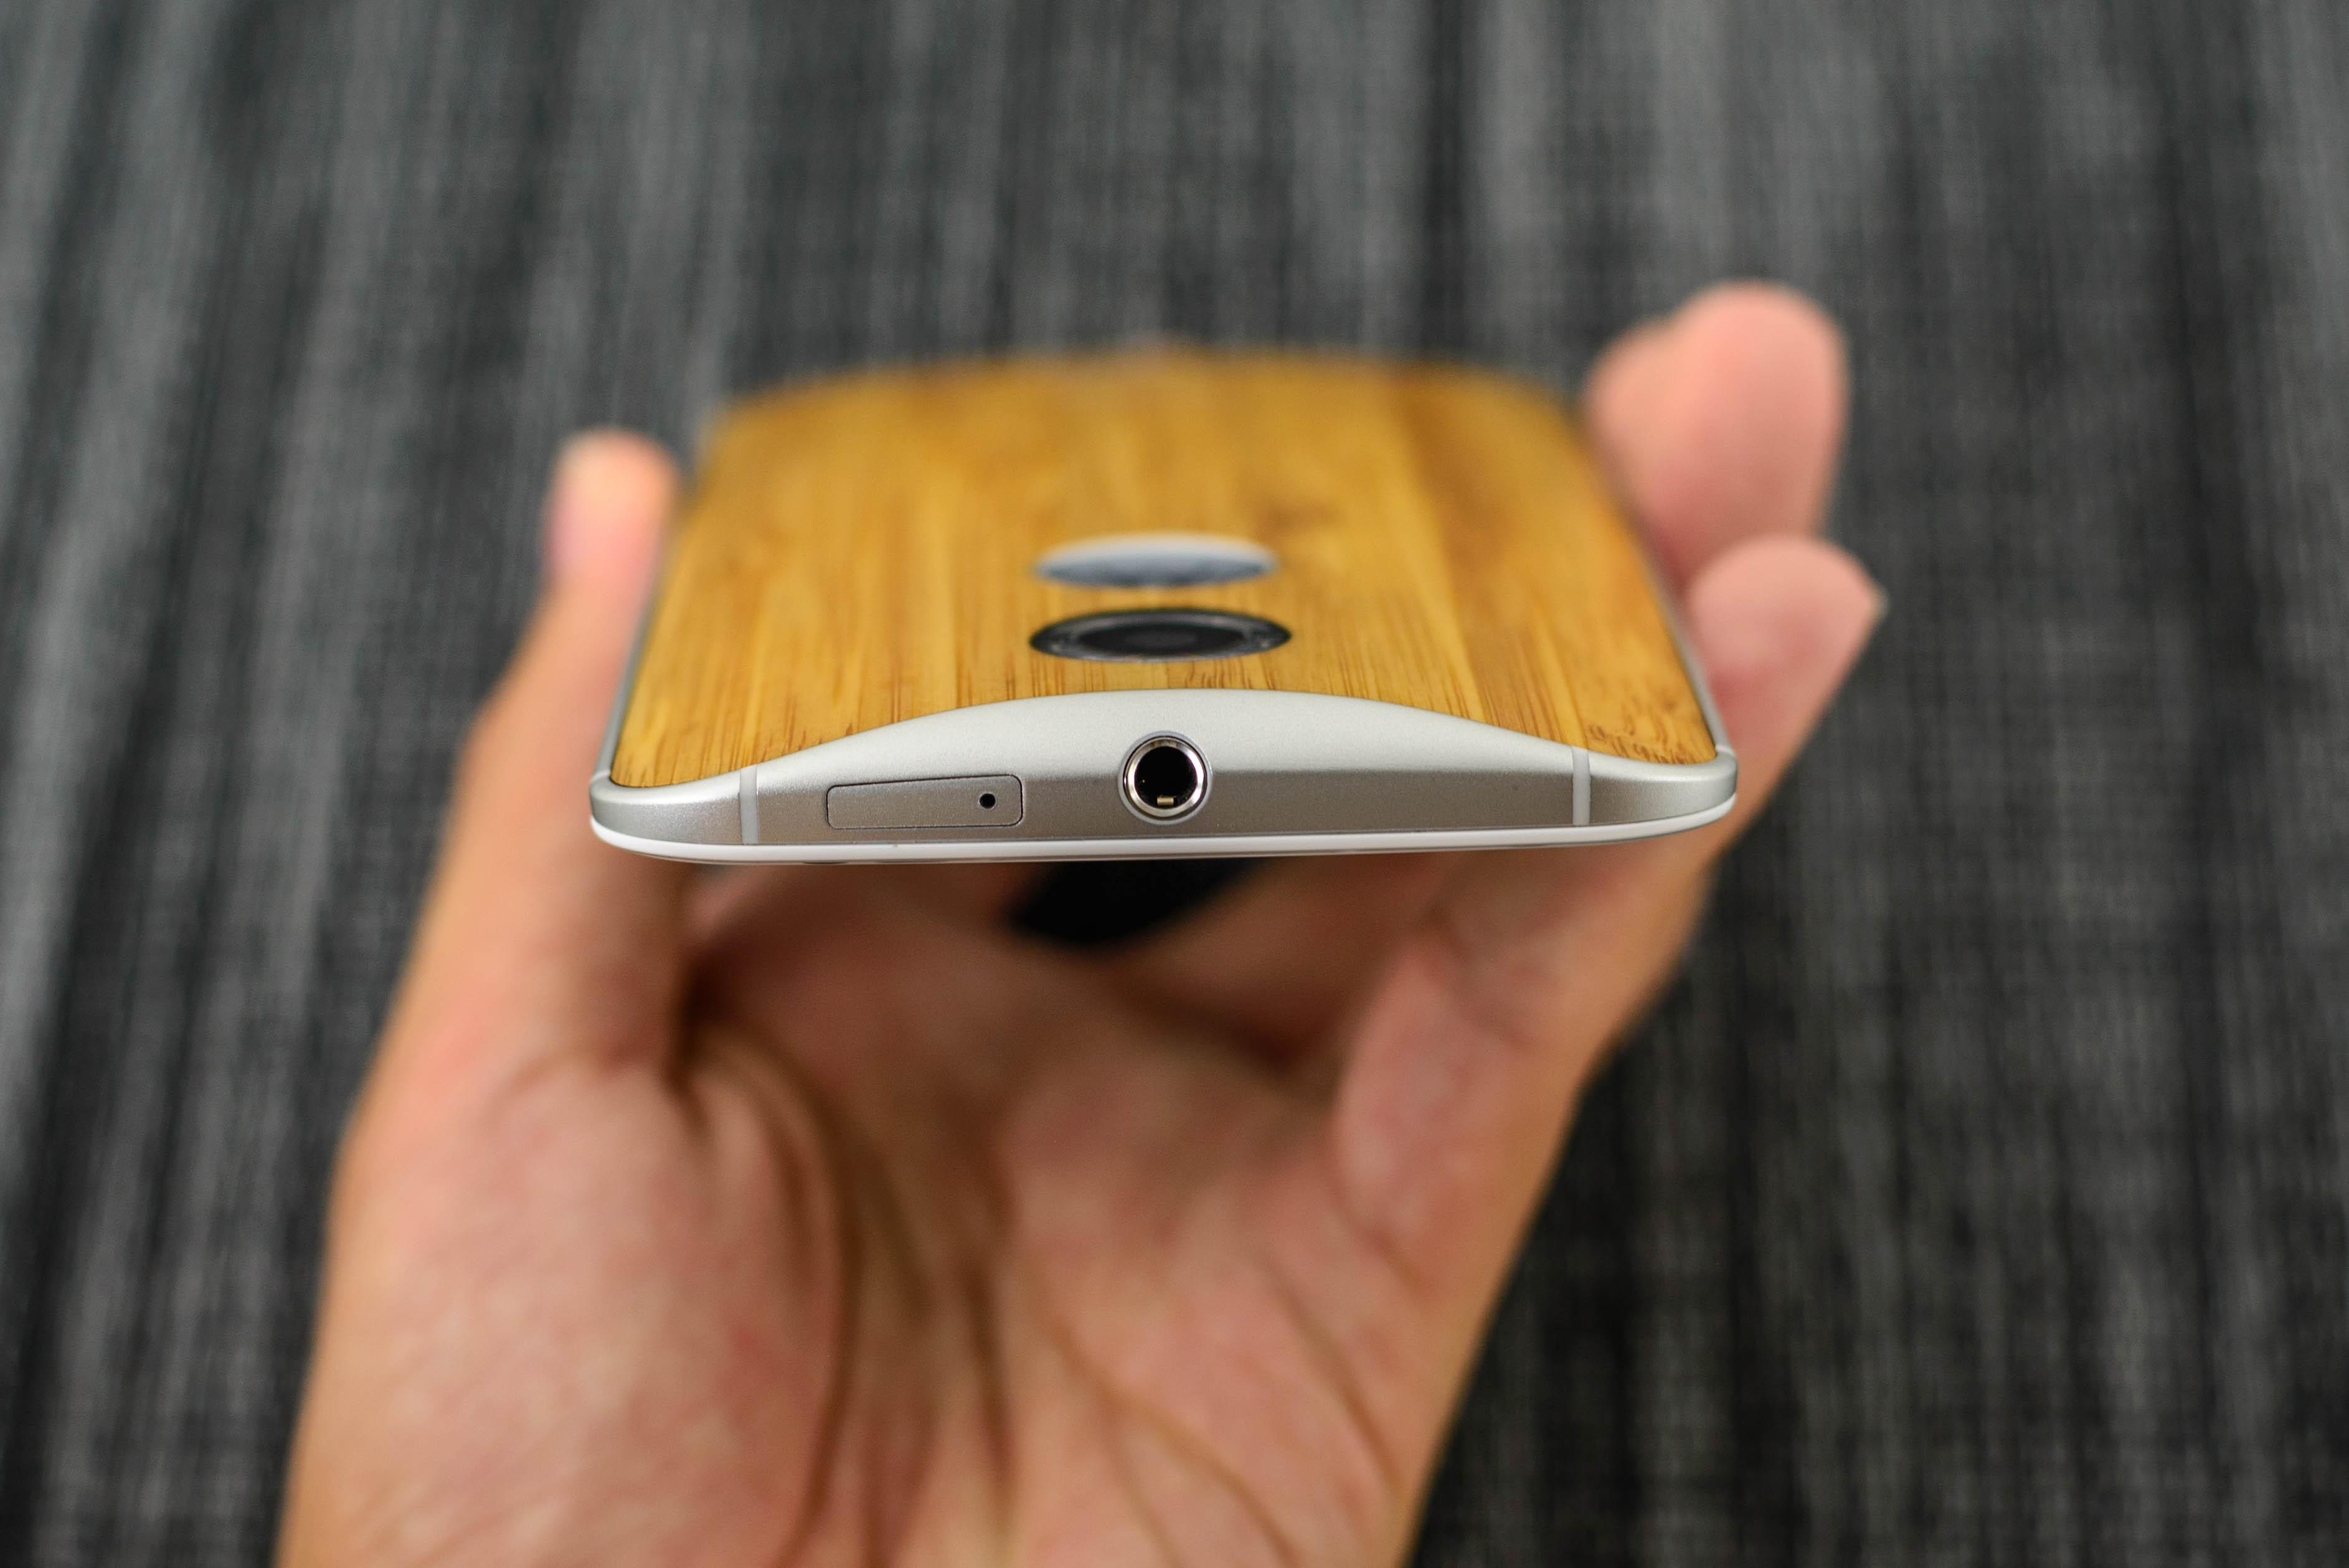 The New Motorola Moto X (2nd Gen) Review